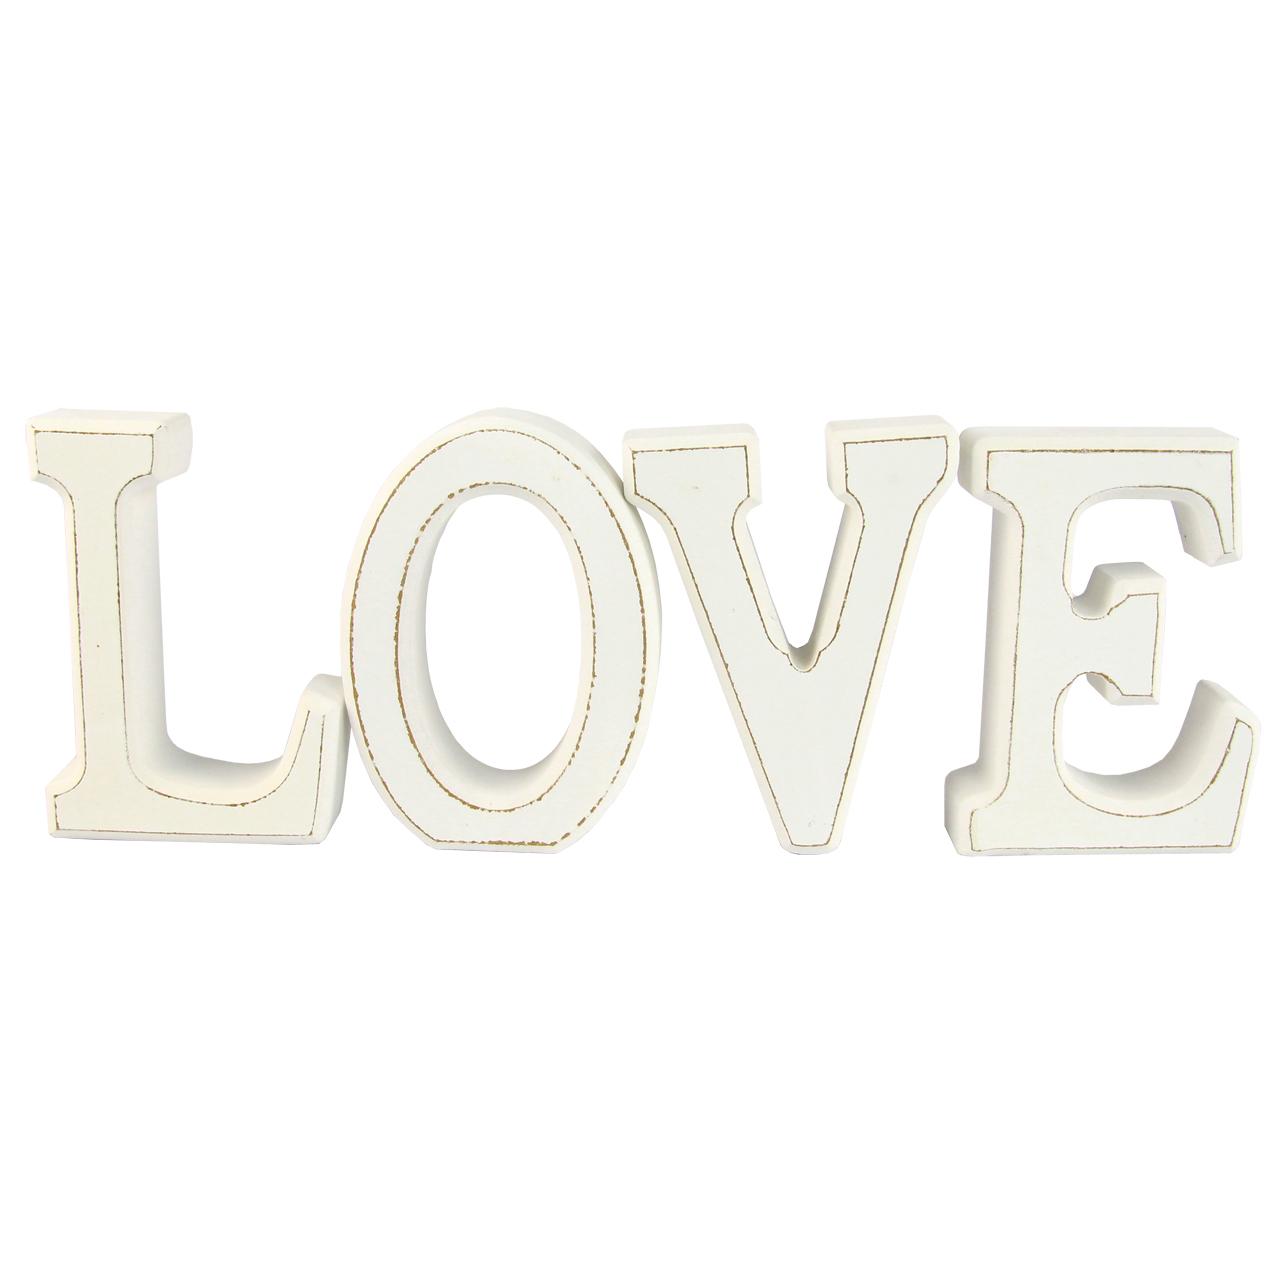 Litere Decorative Love Din Lemn Alb